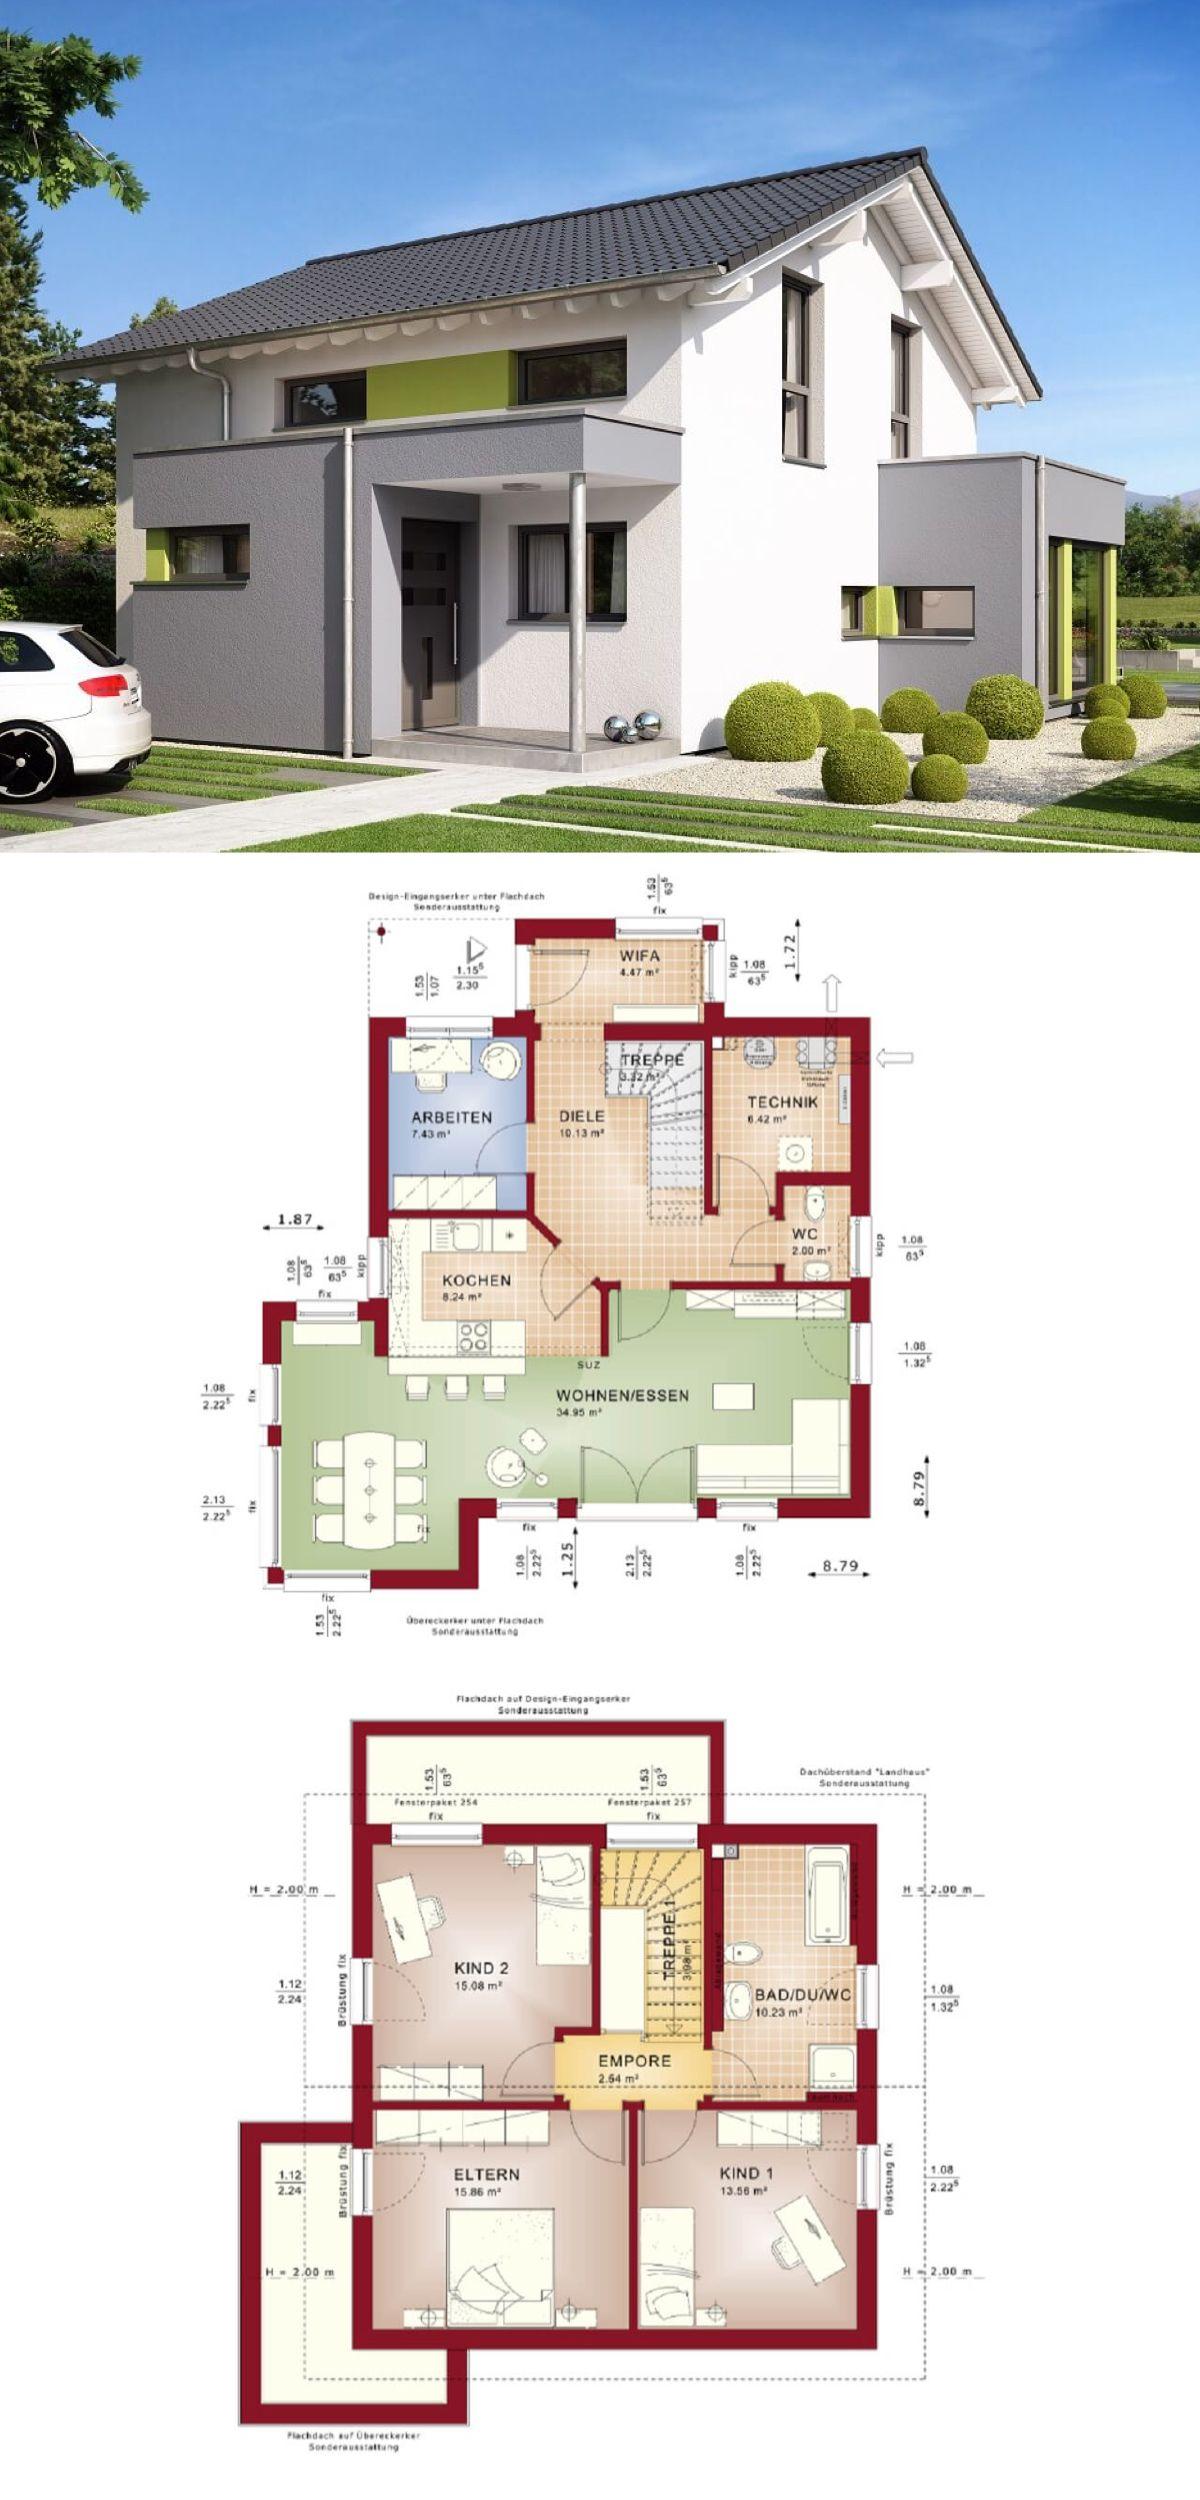 Modernes satteldach haus celebration 125 v7 bien zenker for Modernes einfamilienhaus grundriss